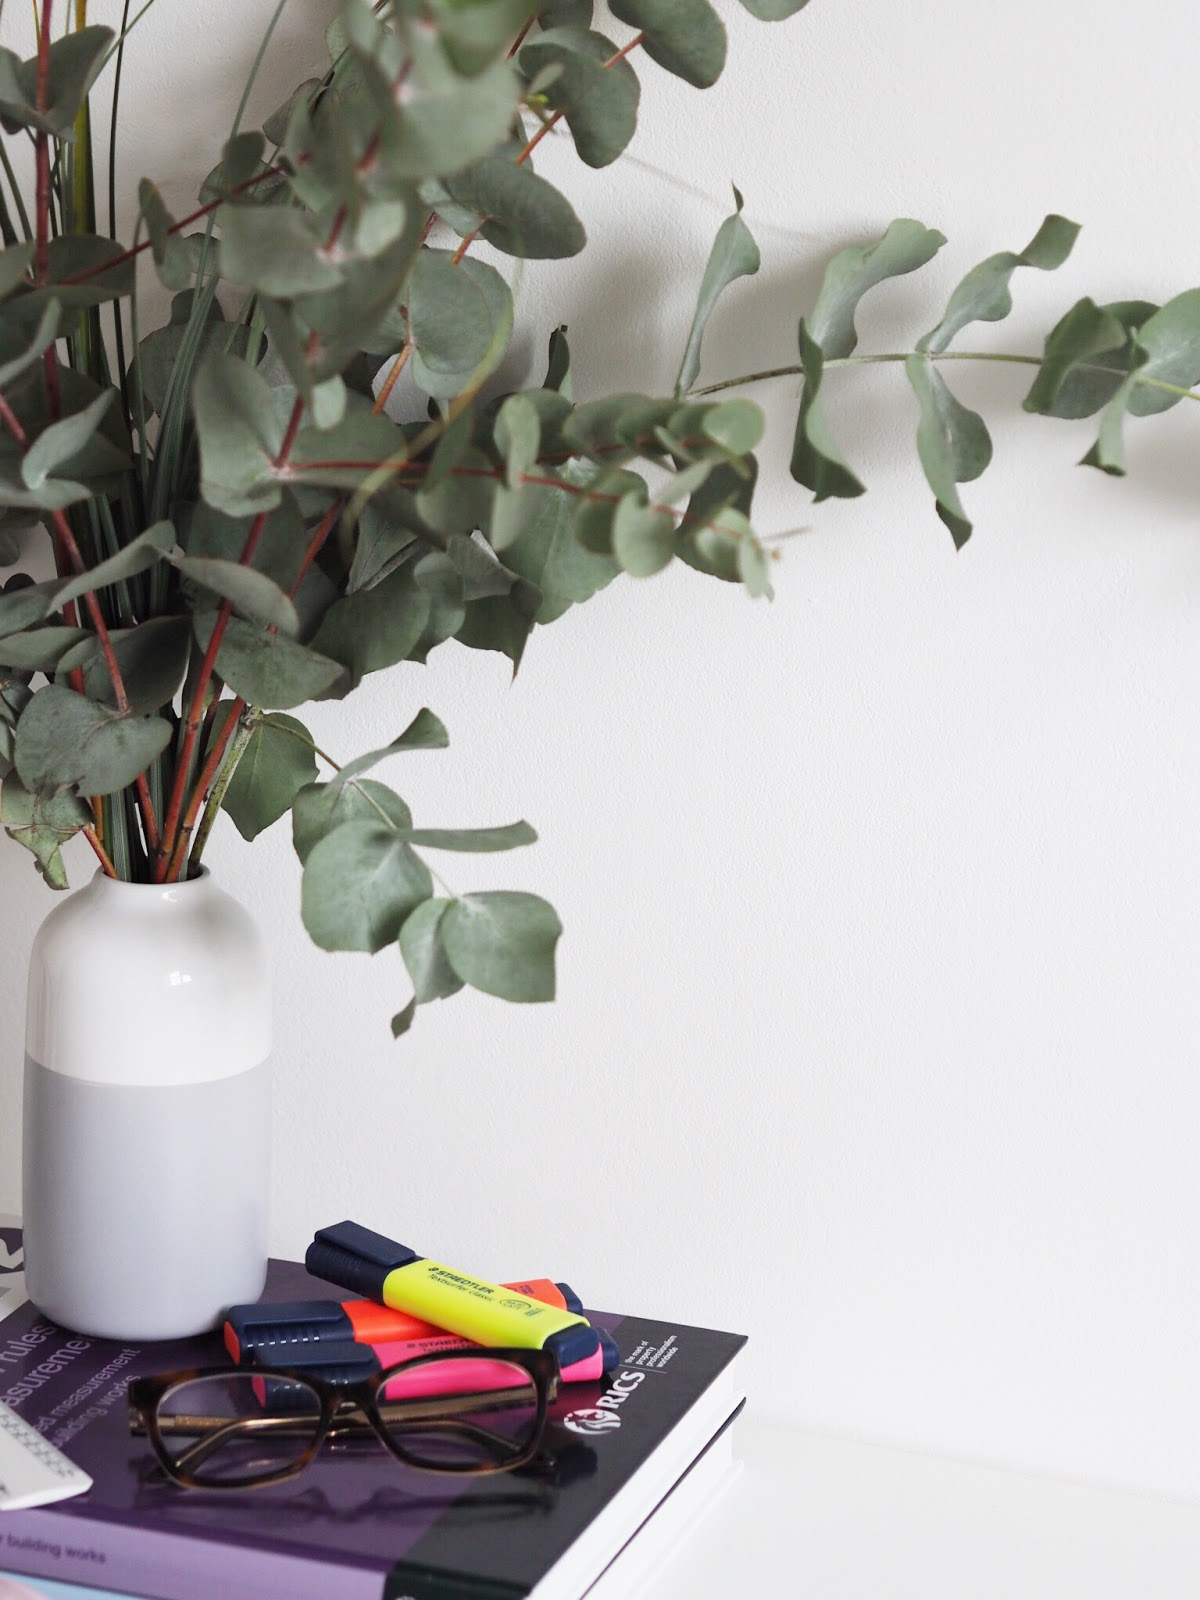 Portrait books, glasses, highlighters and vase of eucalyptus